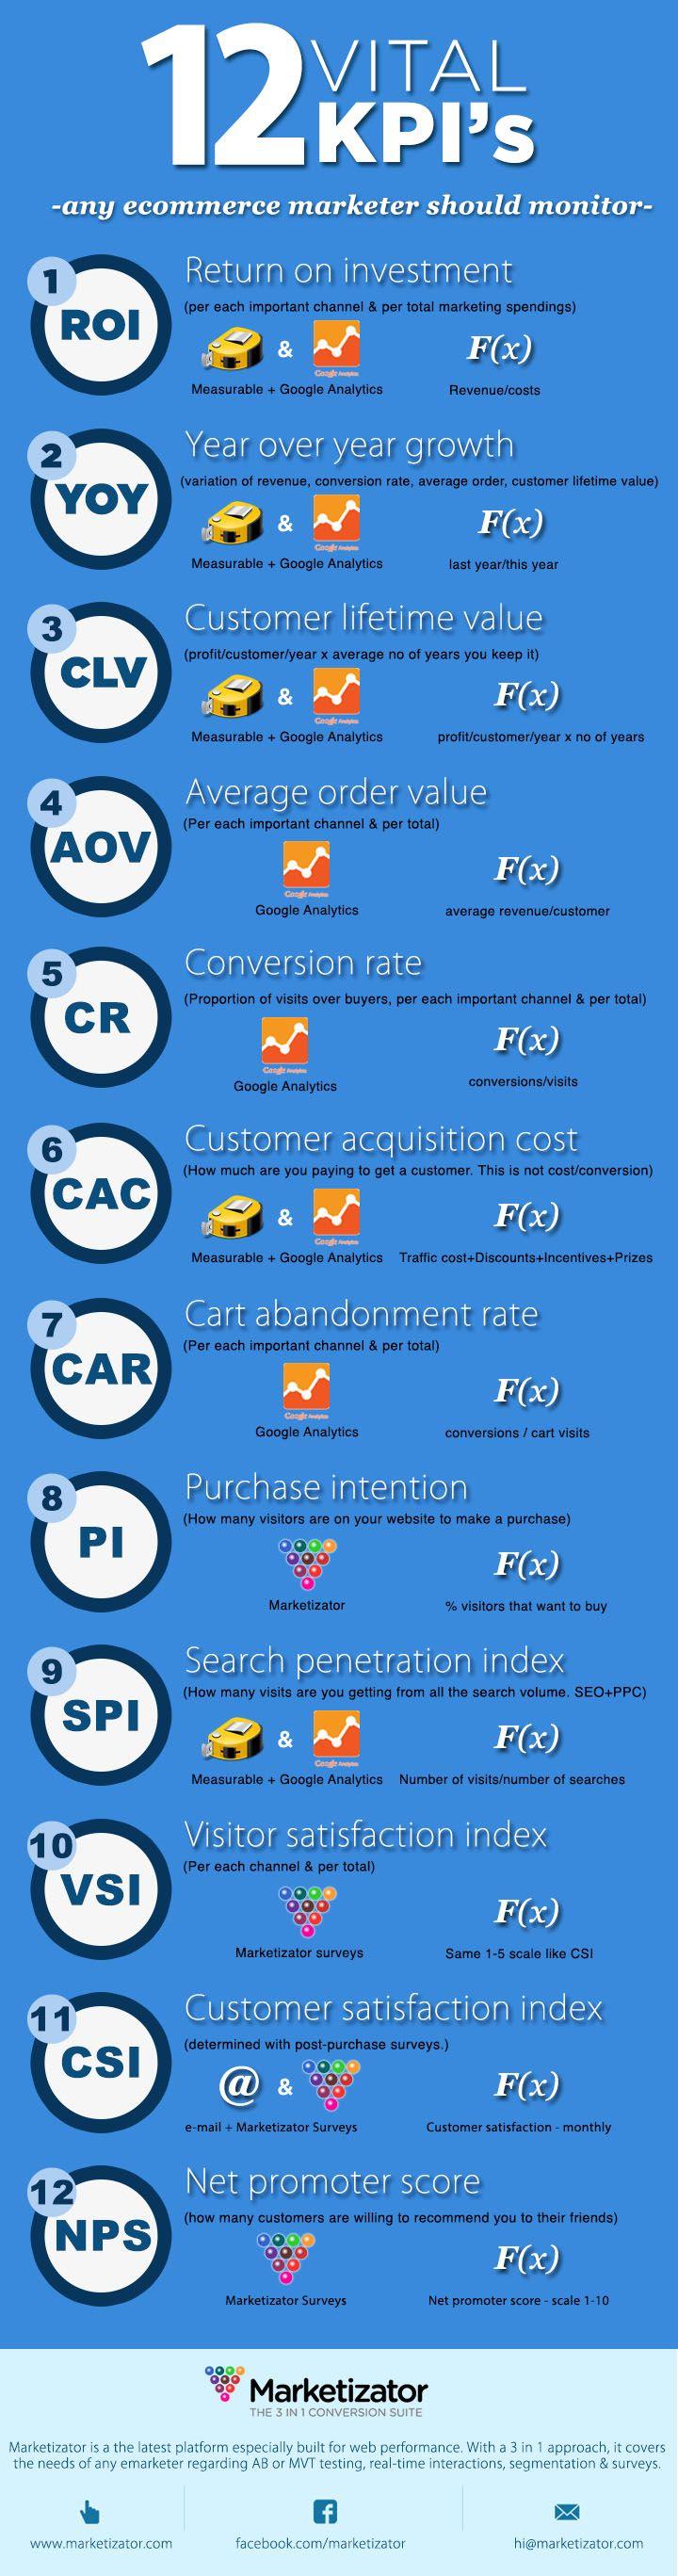 Infografia - 12 KPI's vitales en Comercio Electrónico - Love a good success story? Lea...